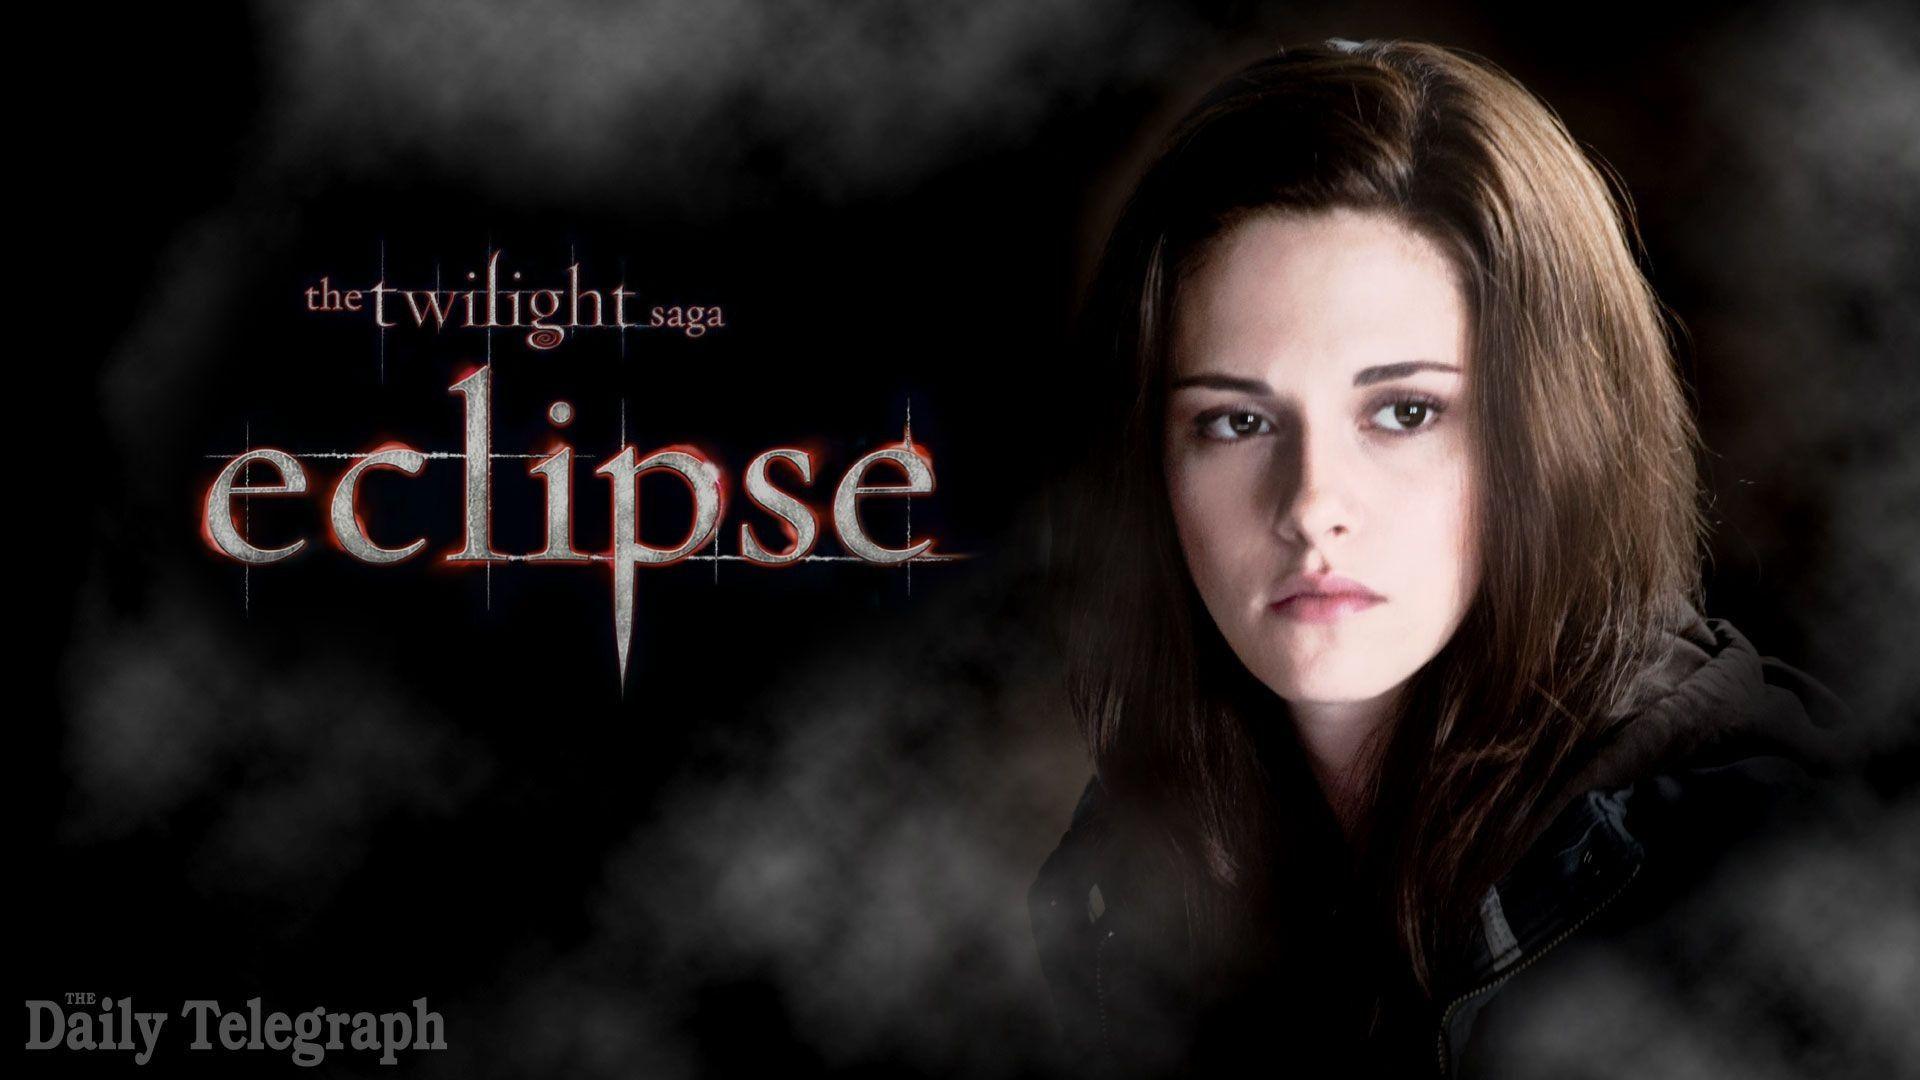 Res 1920x1080 Twilight Saga Eclipse Wallpaper Hd Widescreen Movie Wallpaper 3 Twilight Twilight Saga Twilight Twilight Images